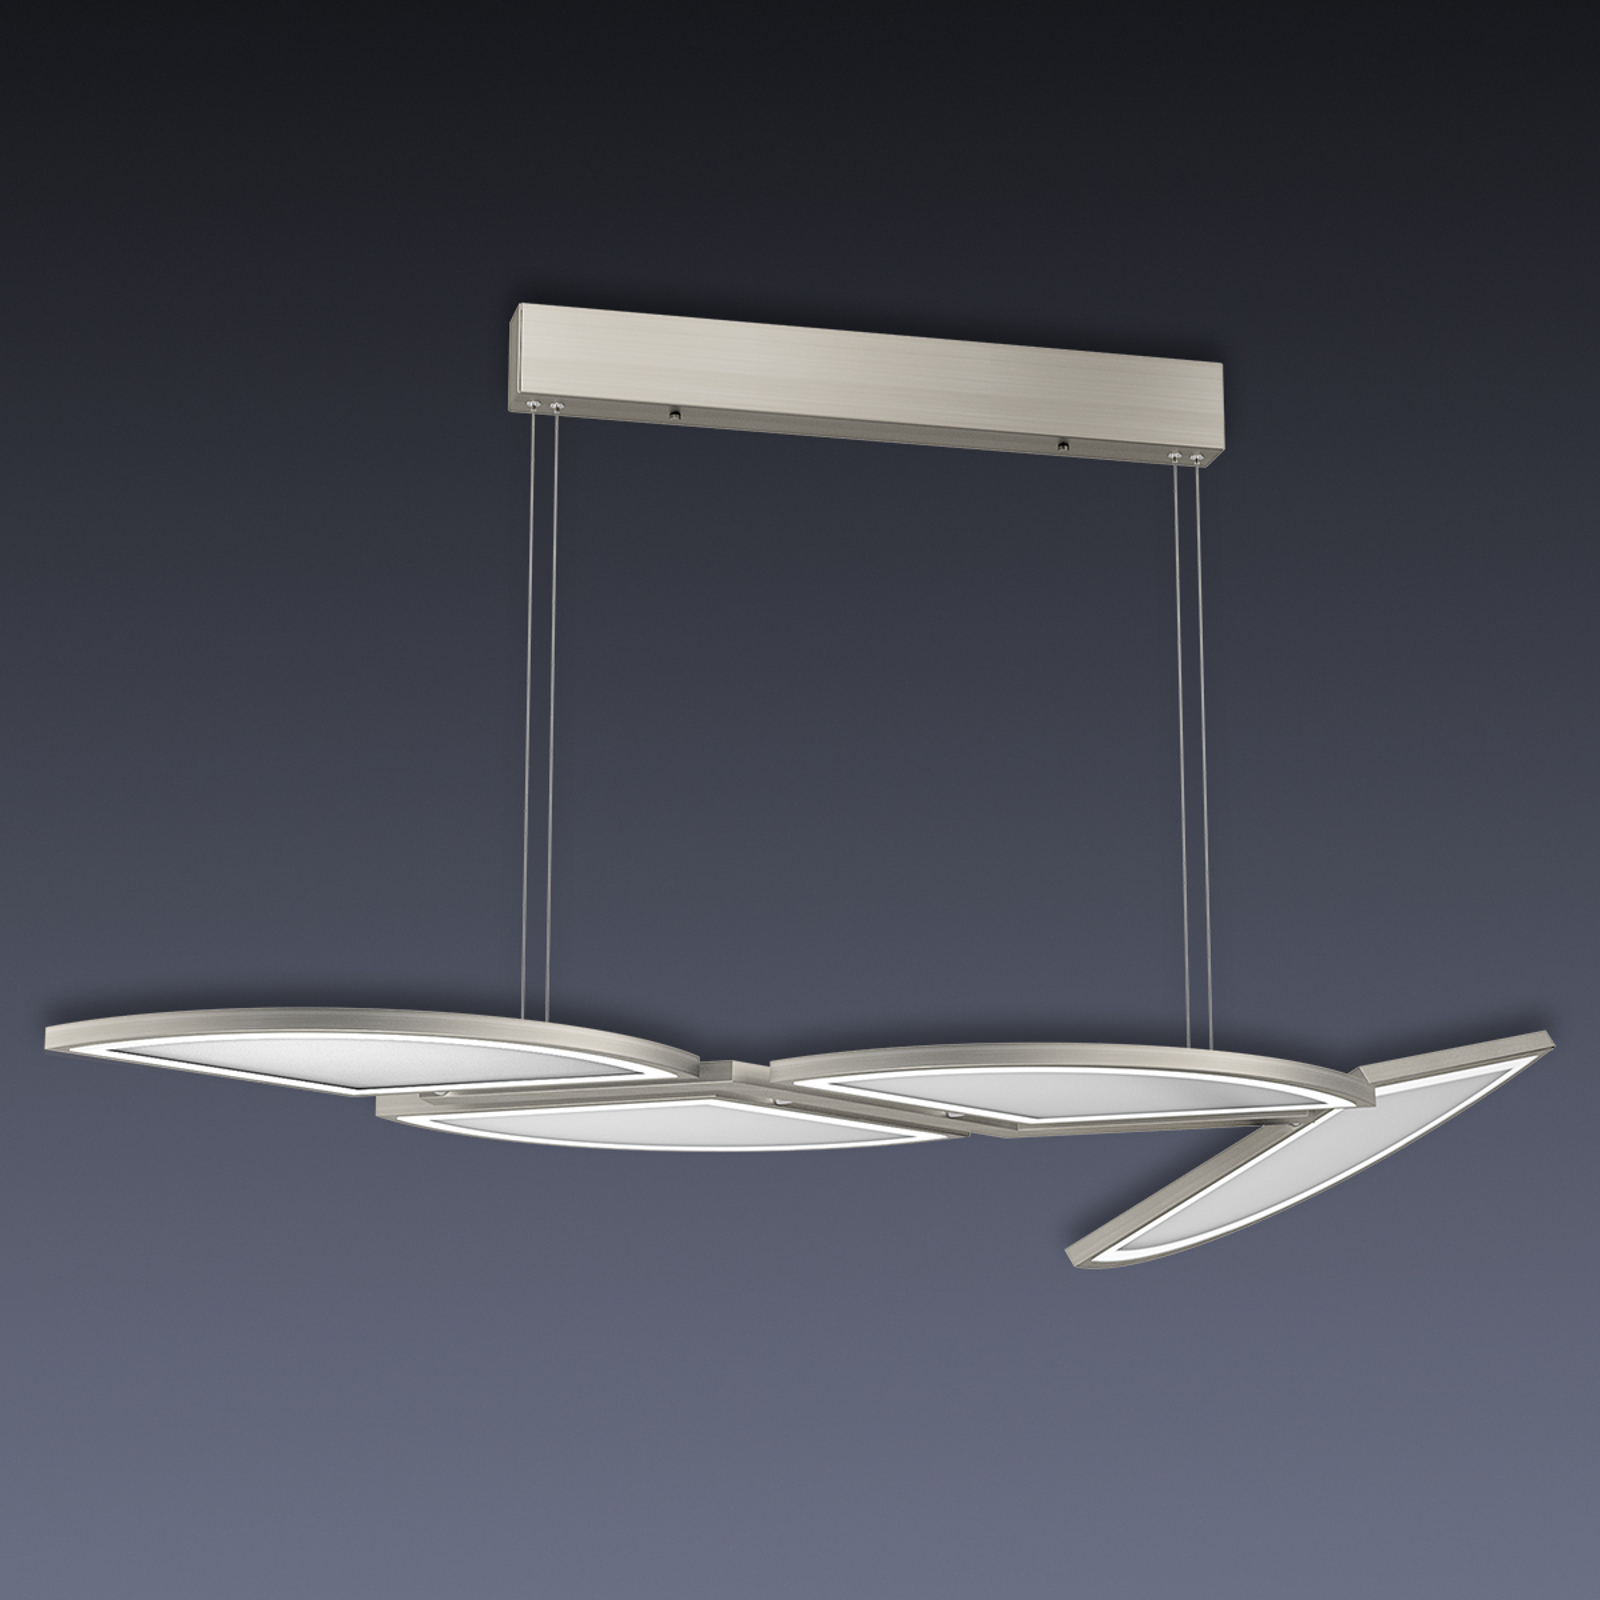 LED-pendellampe Movil med fire lys